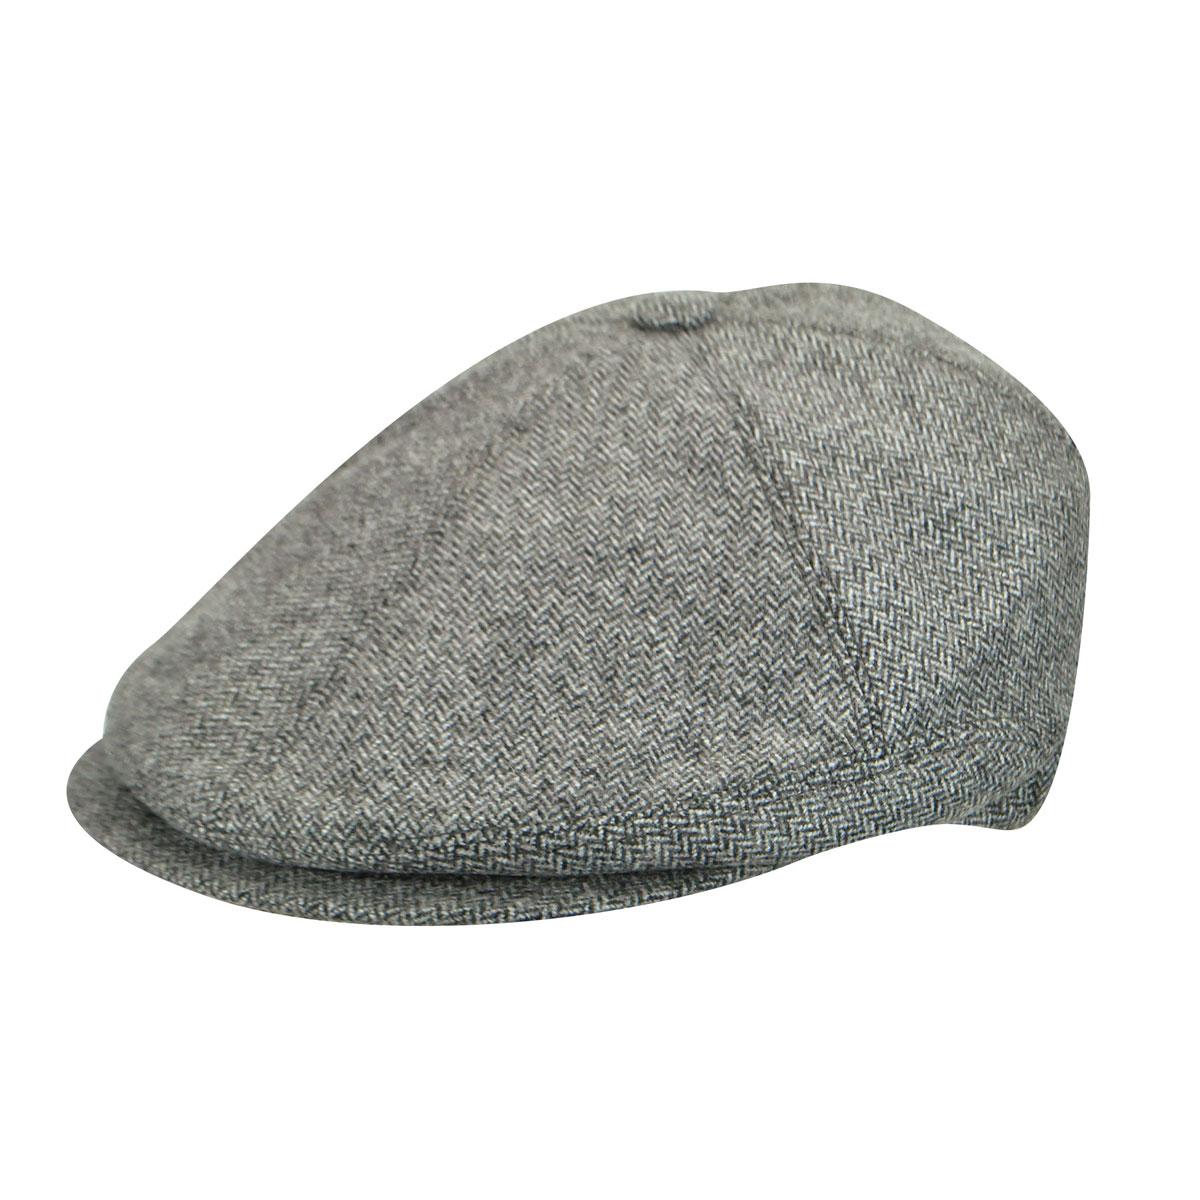 BB150500047 Wool Newsboy Cap $125.00 AT vintagedancer.com